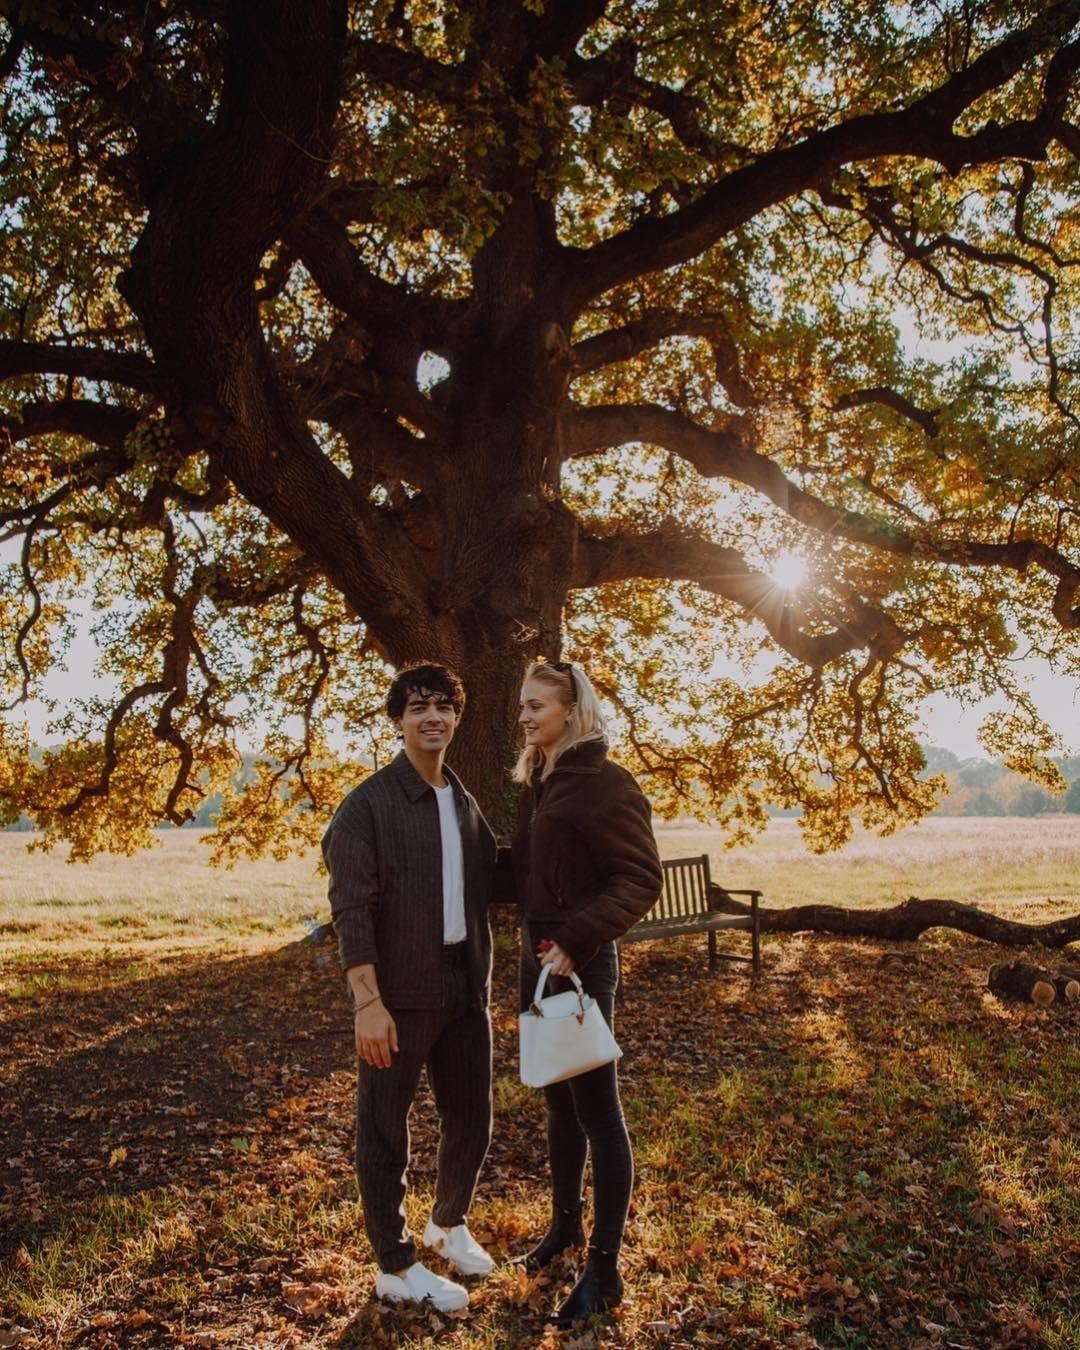 Sophie Turner told us her fiancé, Joe Jonas, makes her the happiest.